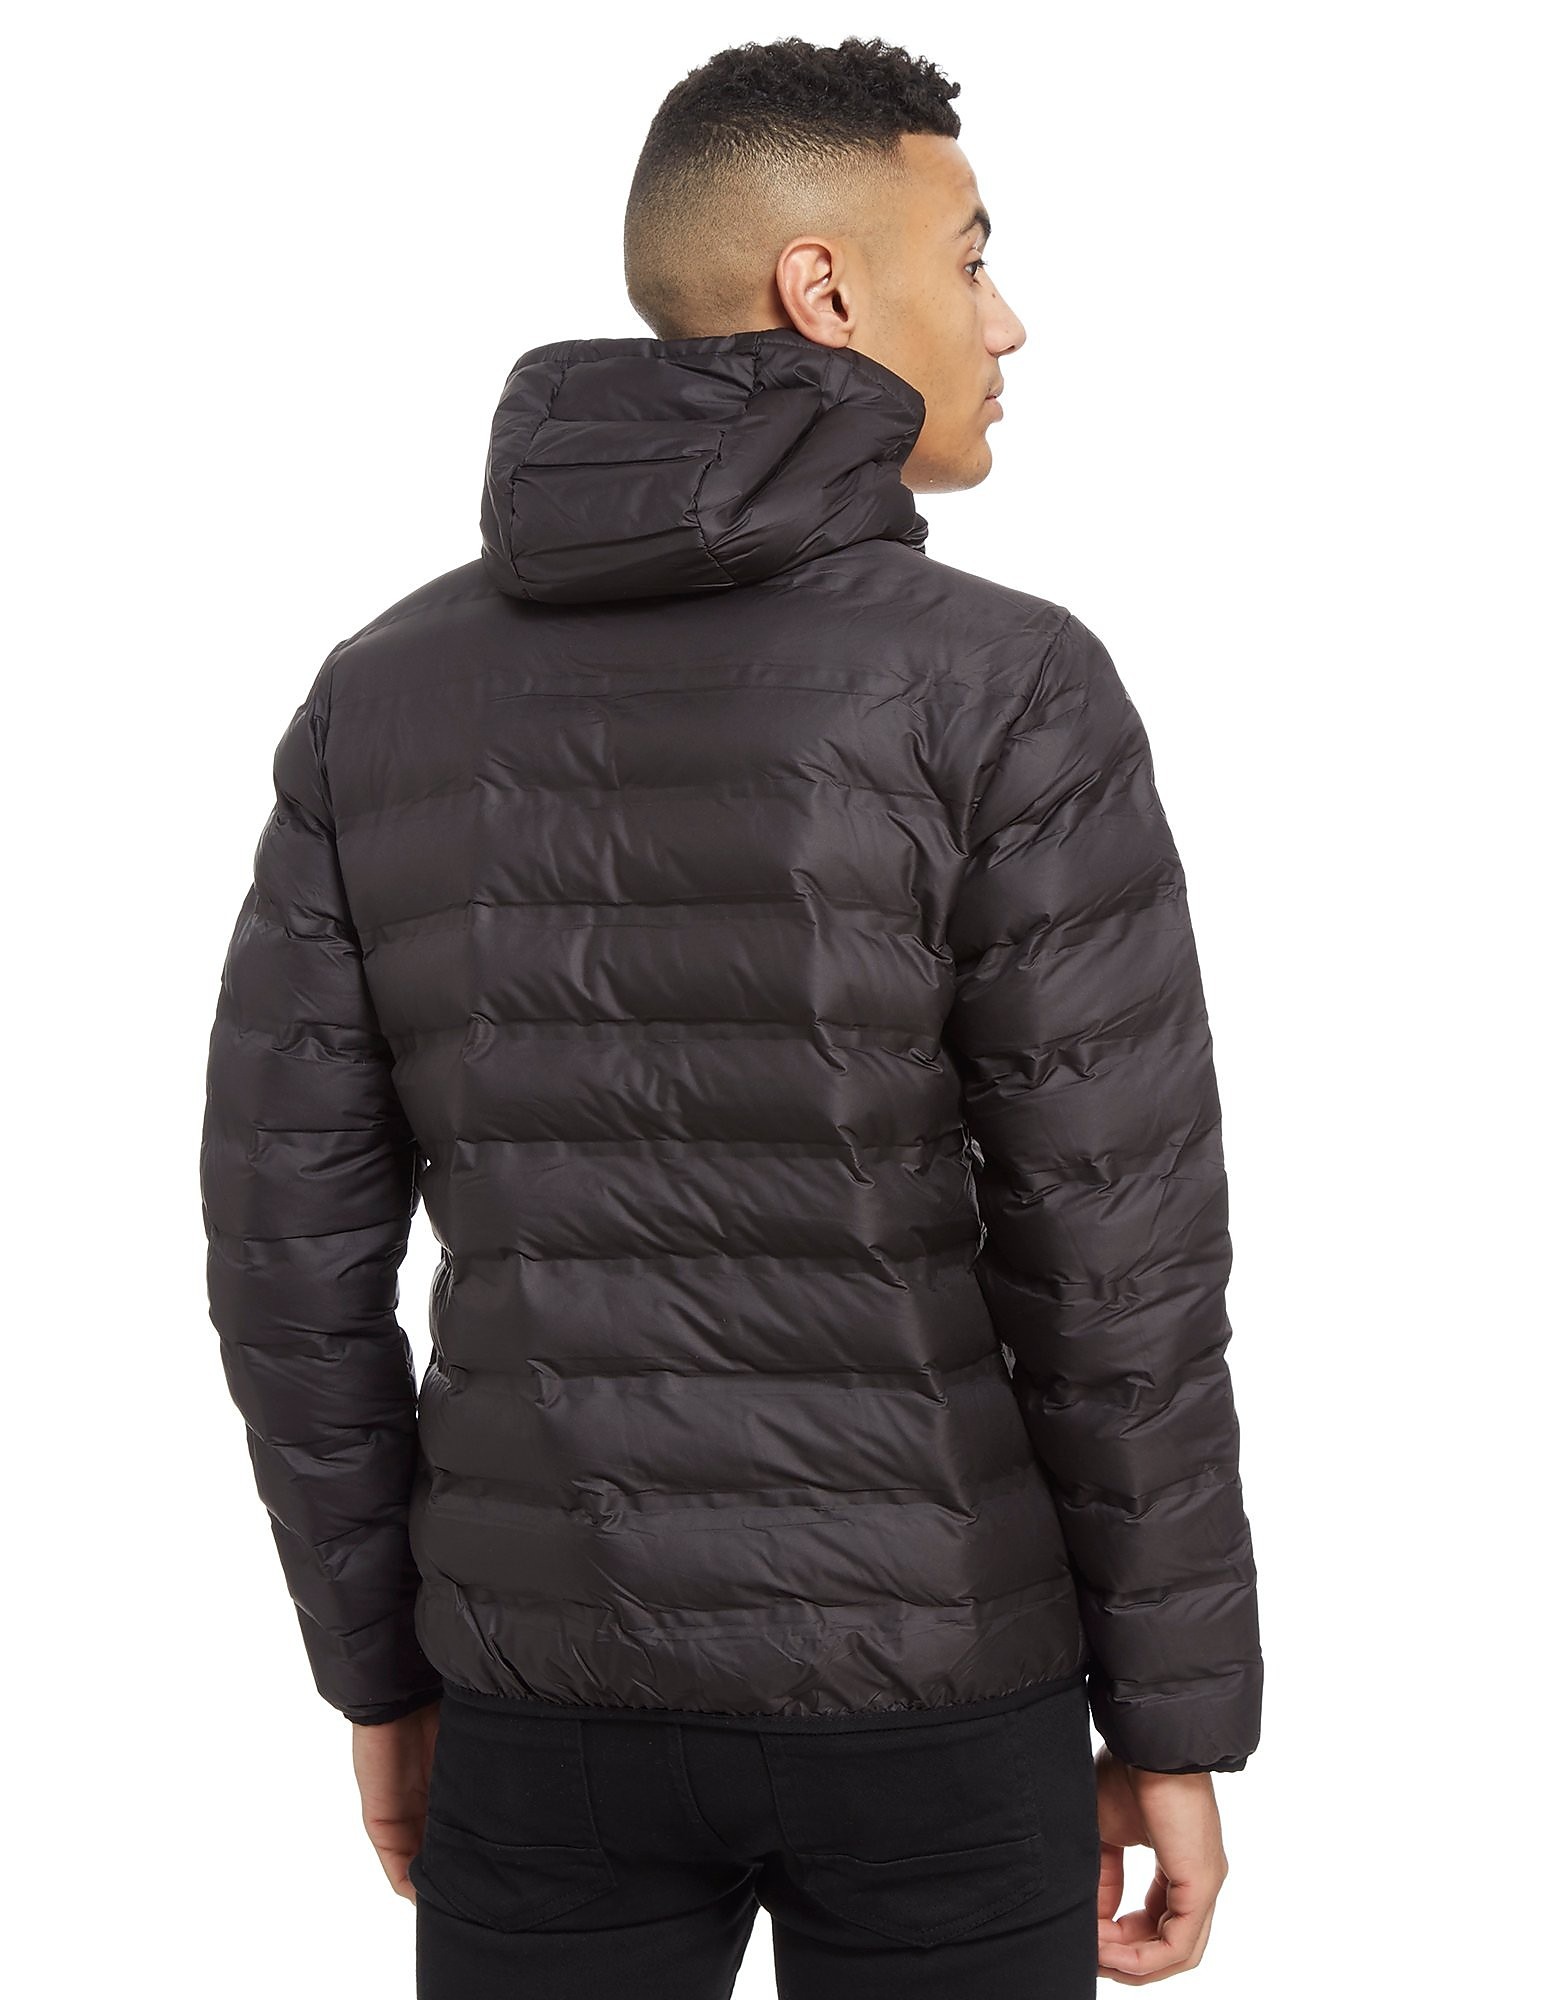 Supply & Demand Road Jacket